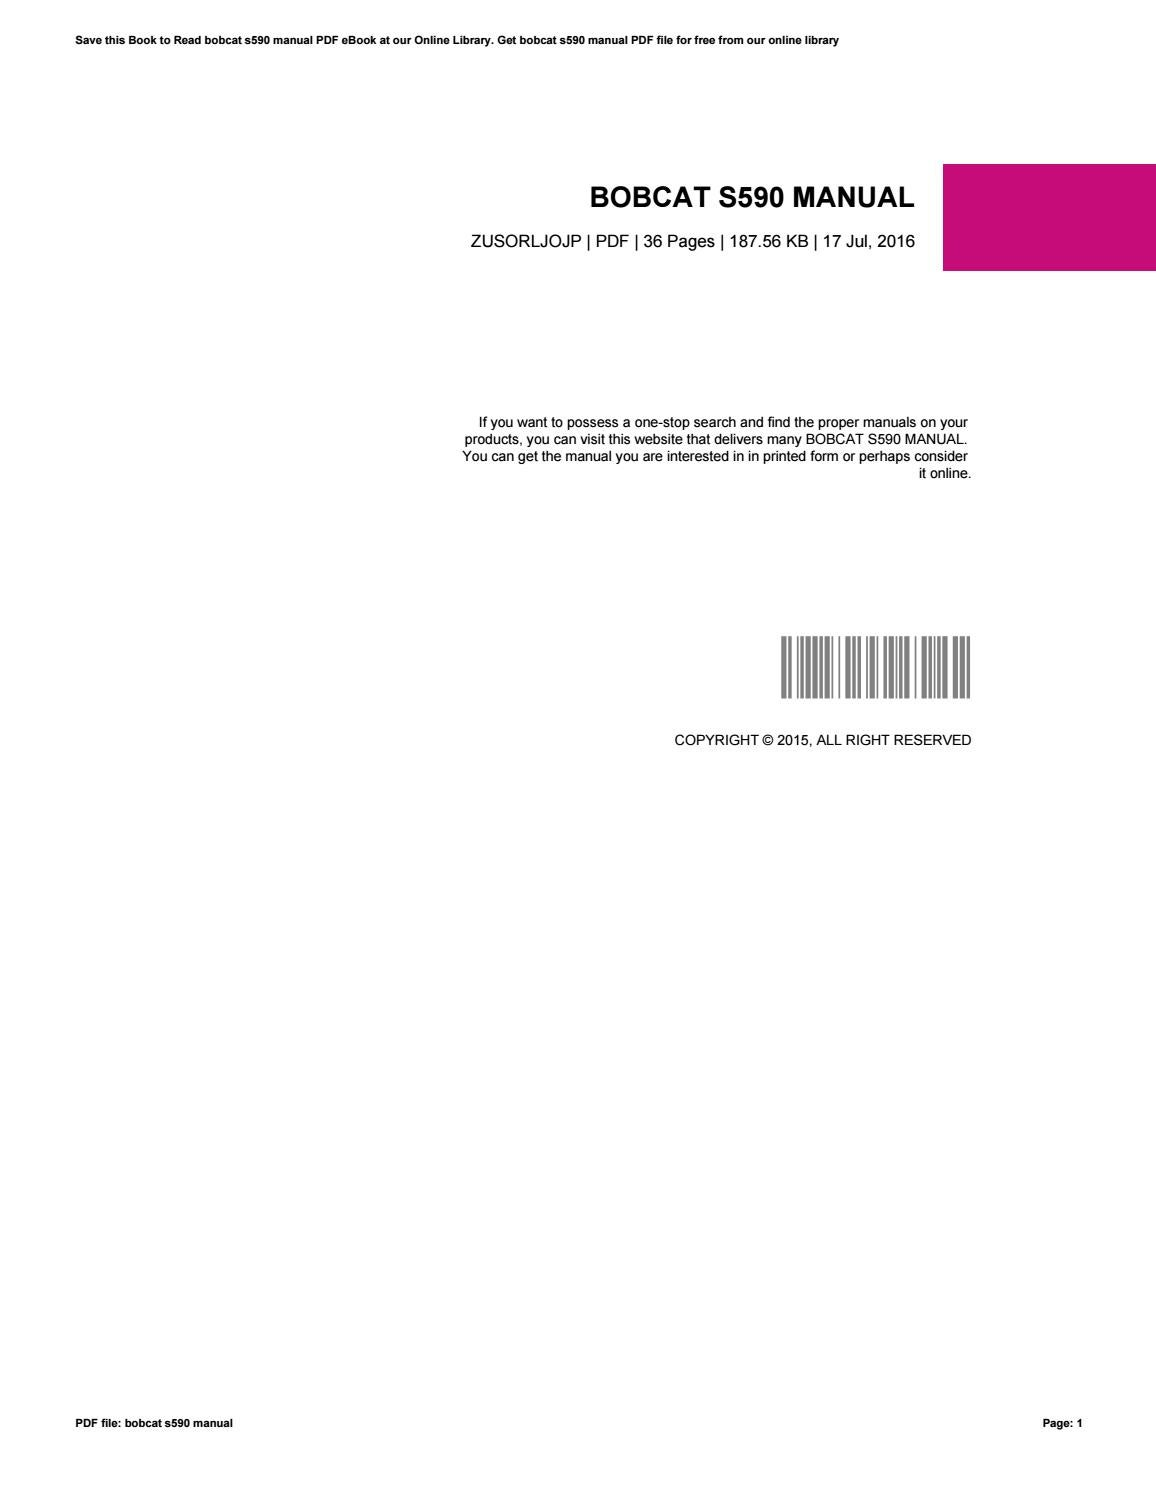 s590 bobcat manual pdf